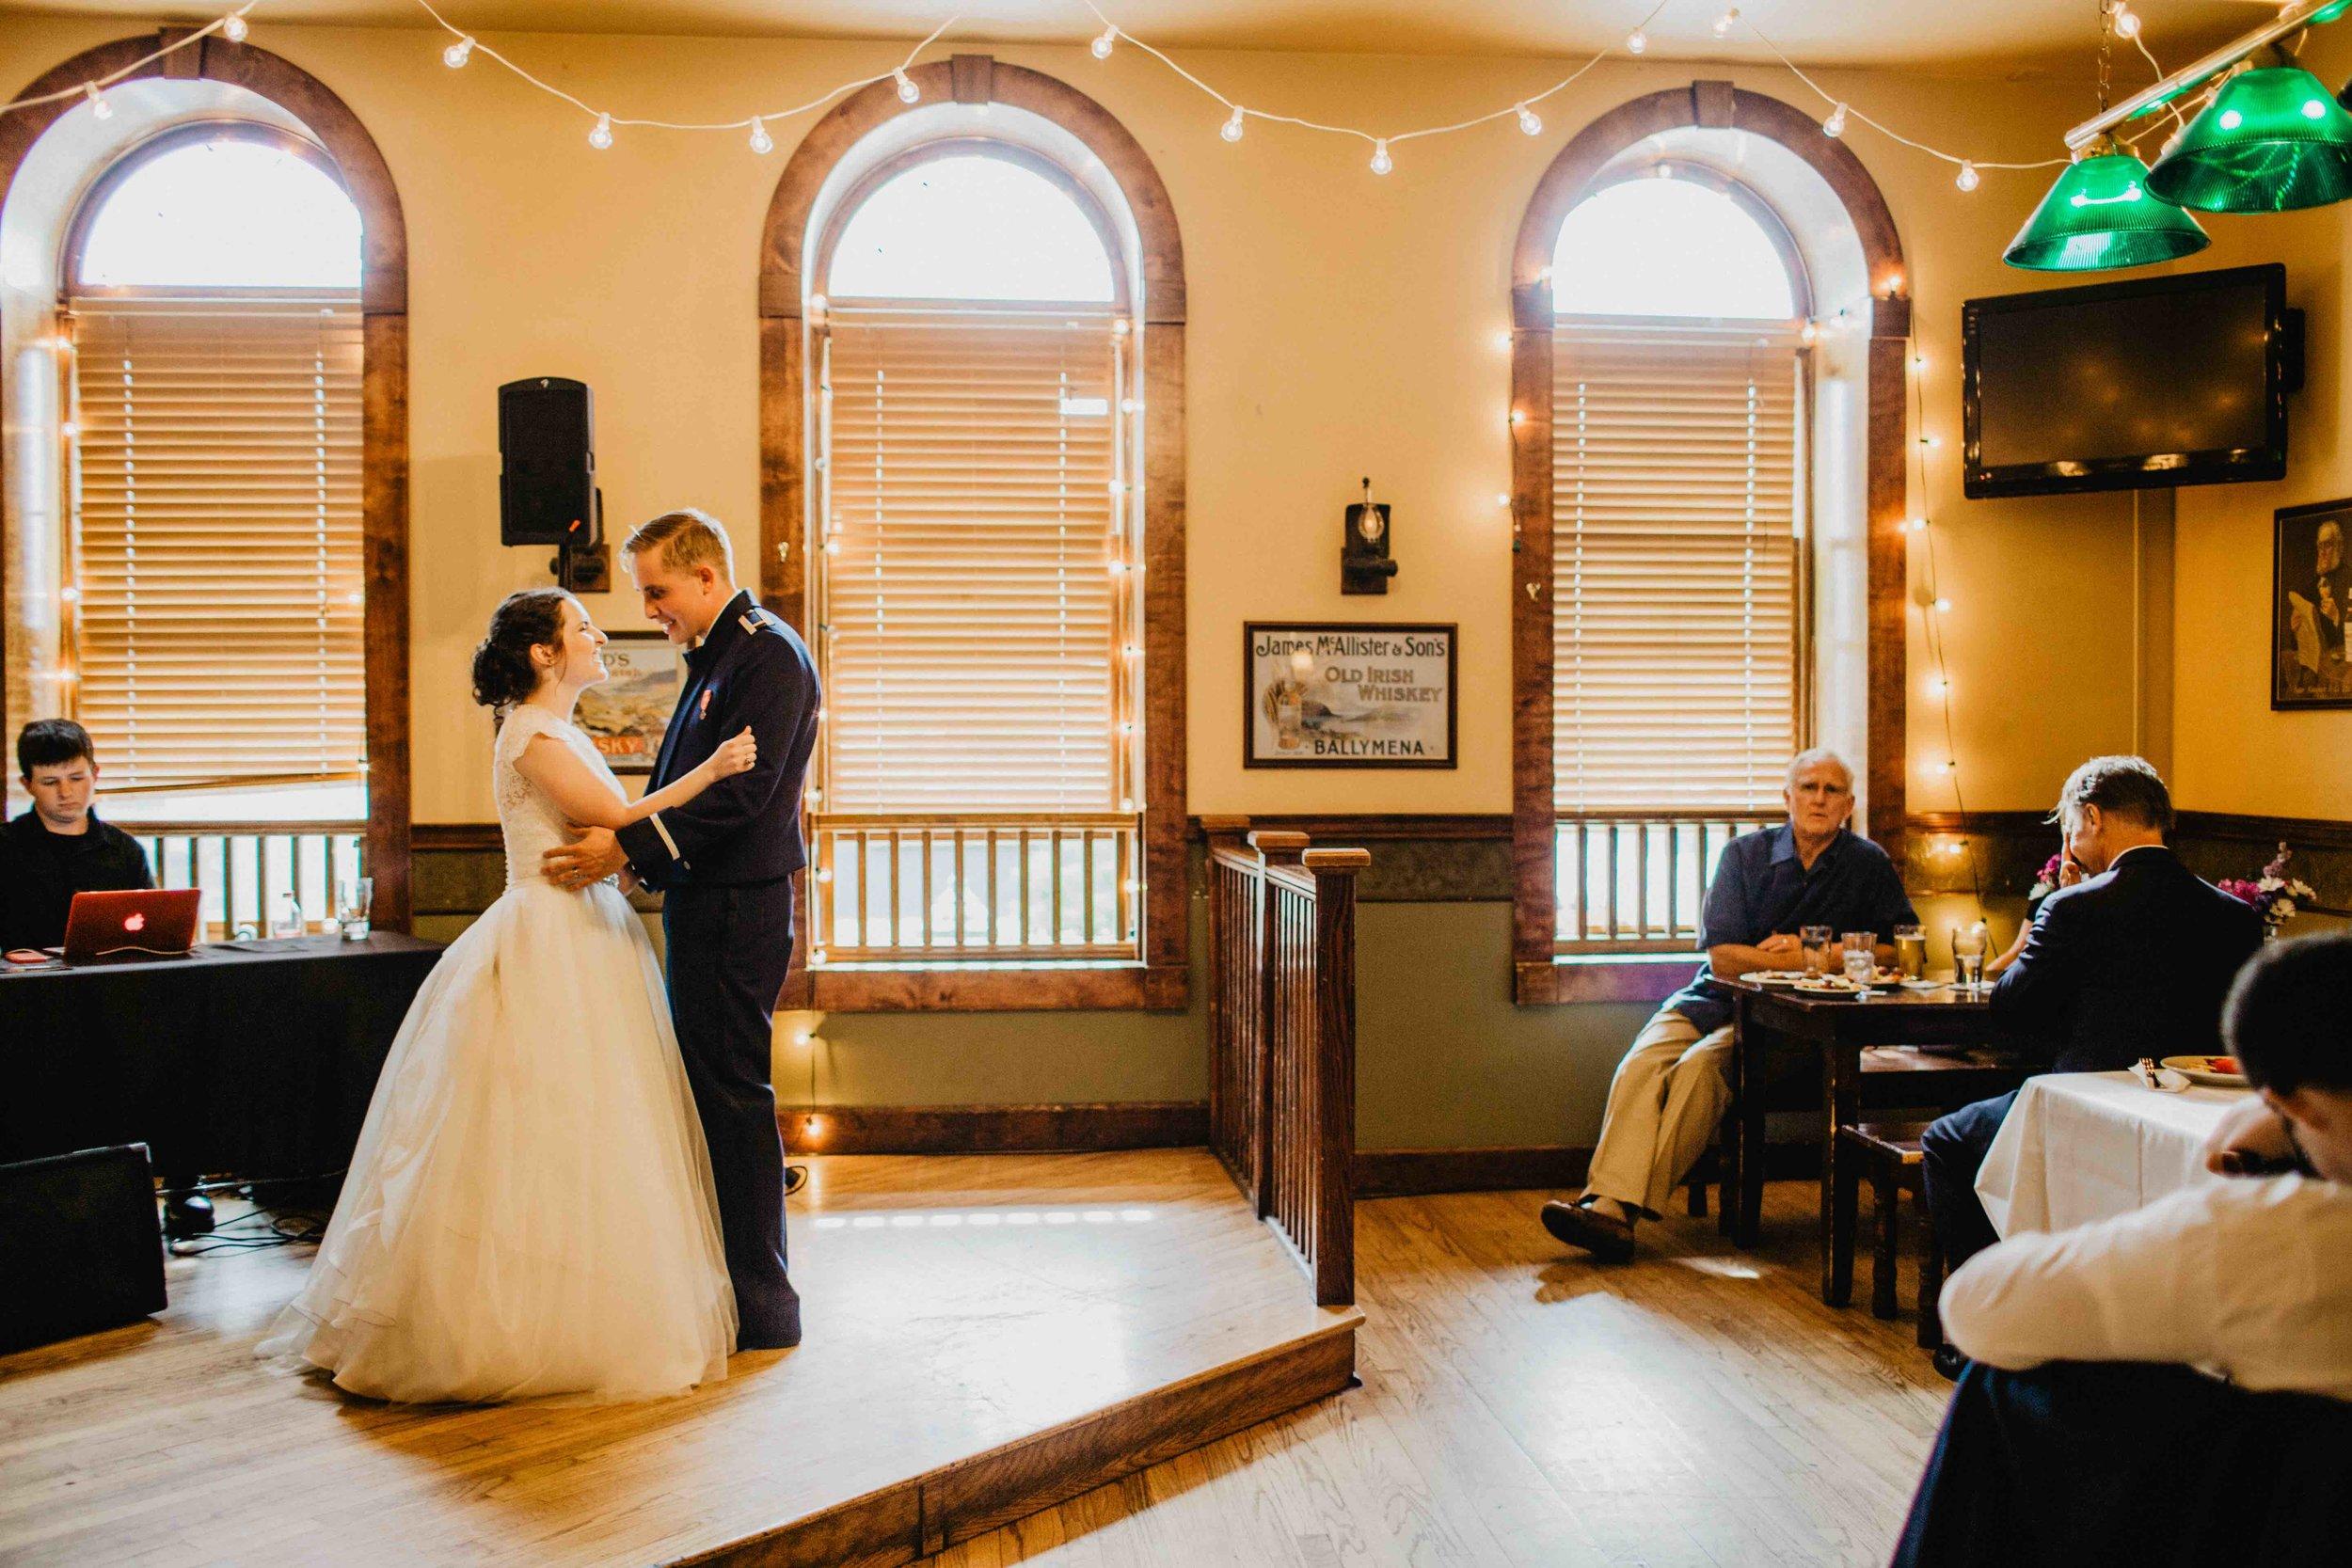 607A6238-colorado-wedding-photographer-denver-springs-vail--colorado-wedding-photographer-denver-springs-vail-.jpeg